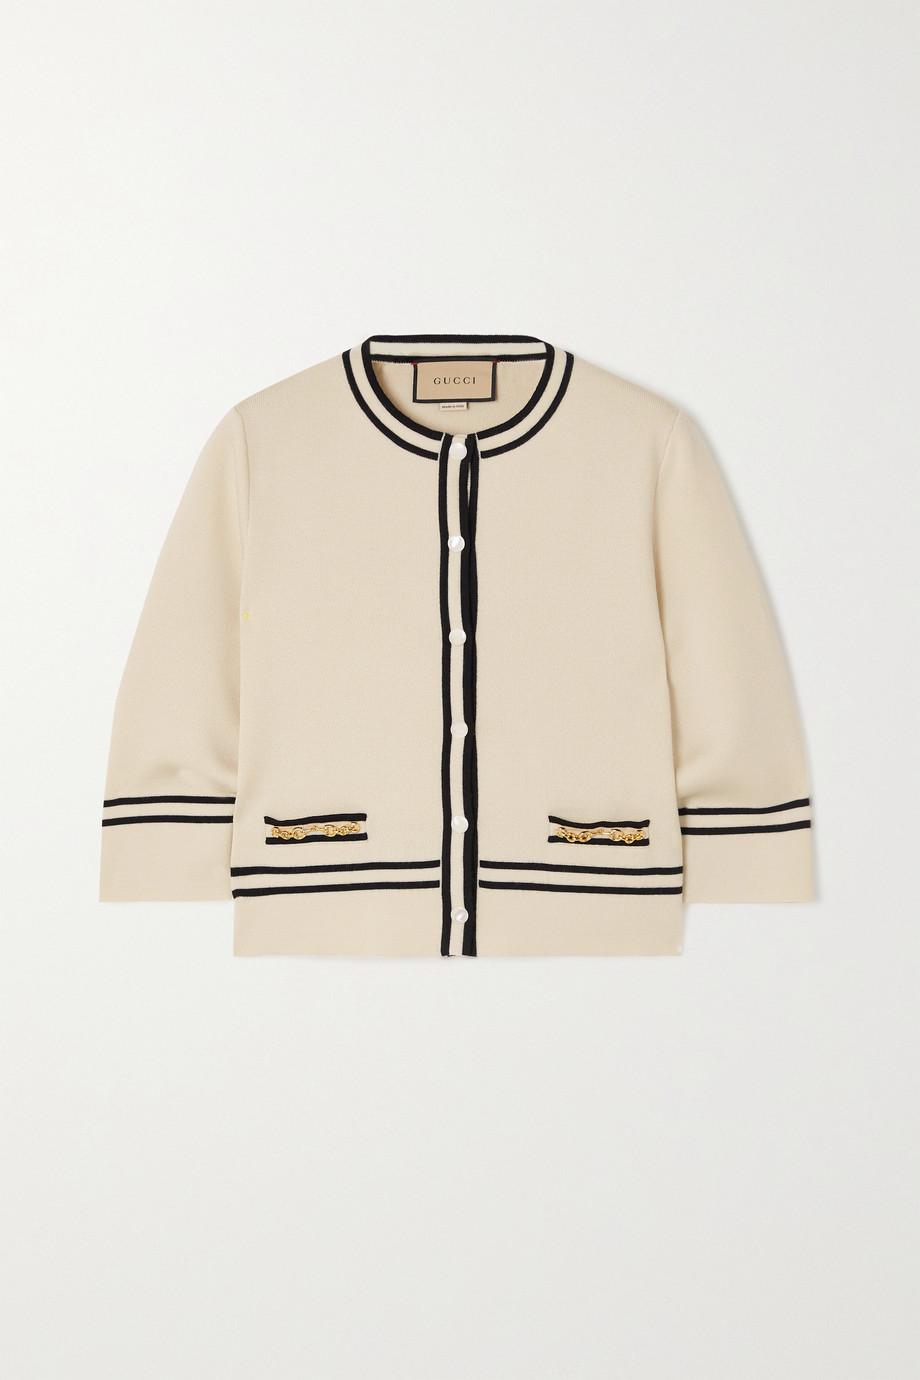 Gucci Horsebit-embellished striped wool cardigan